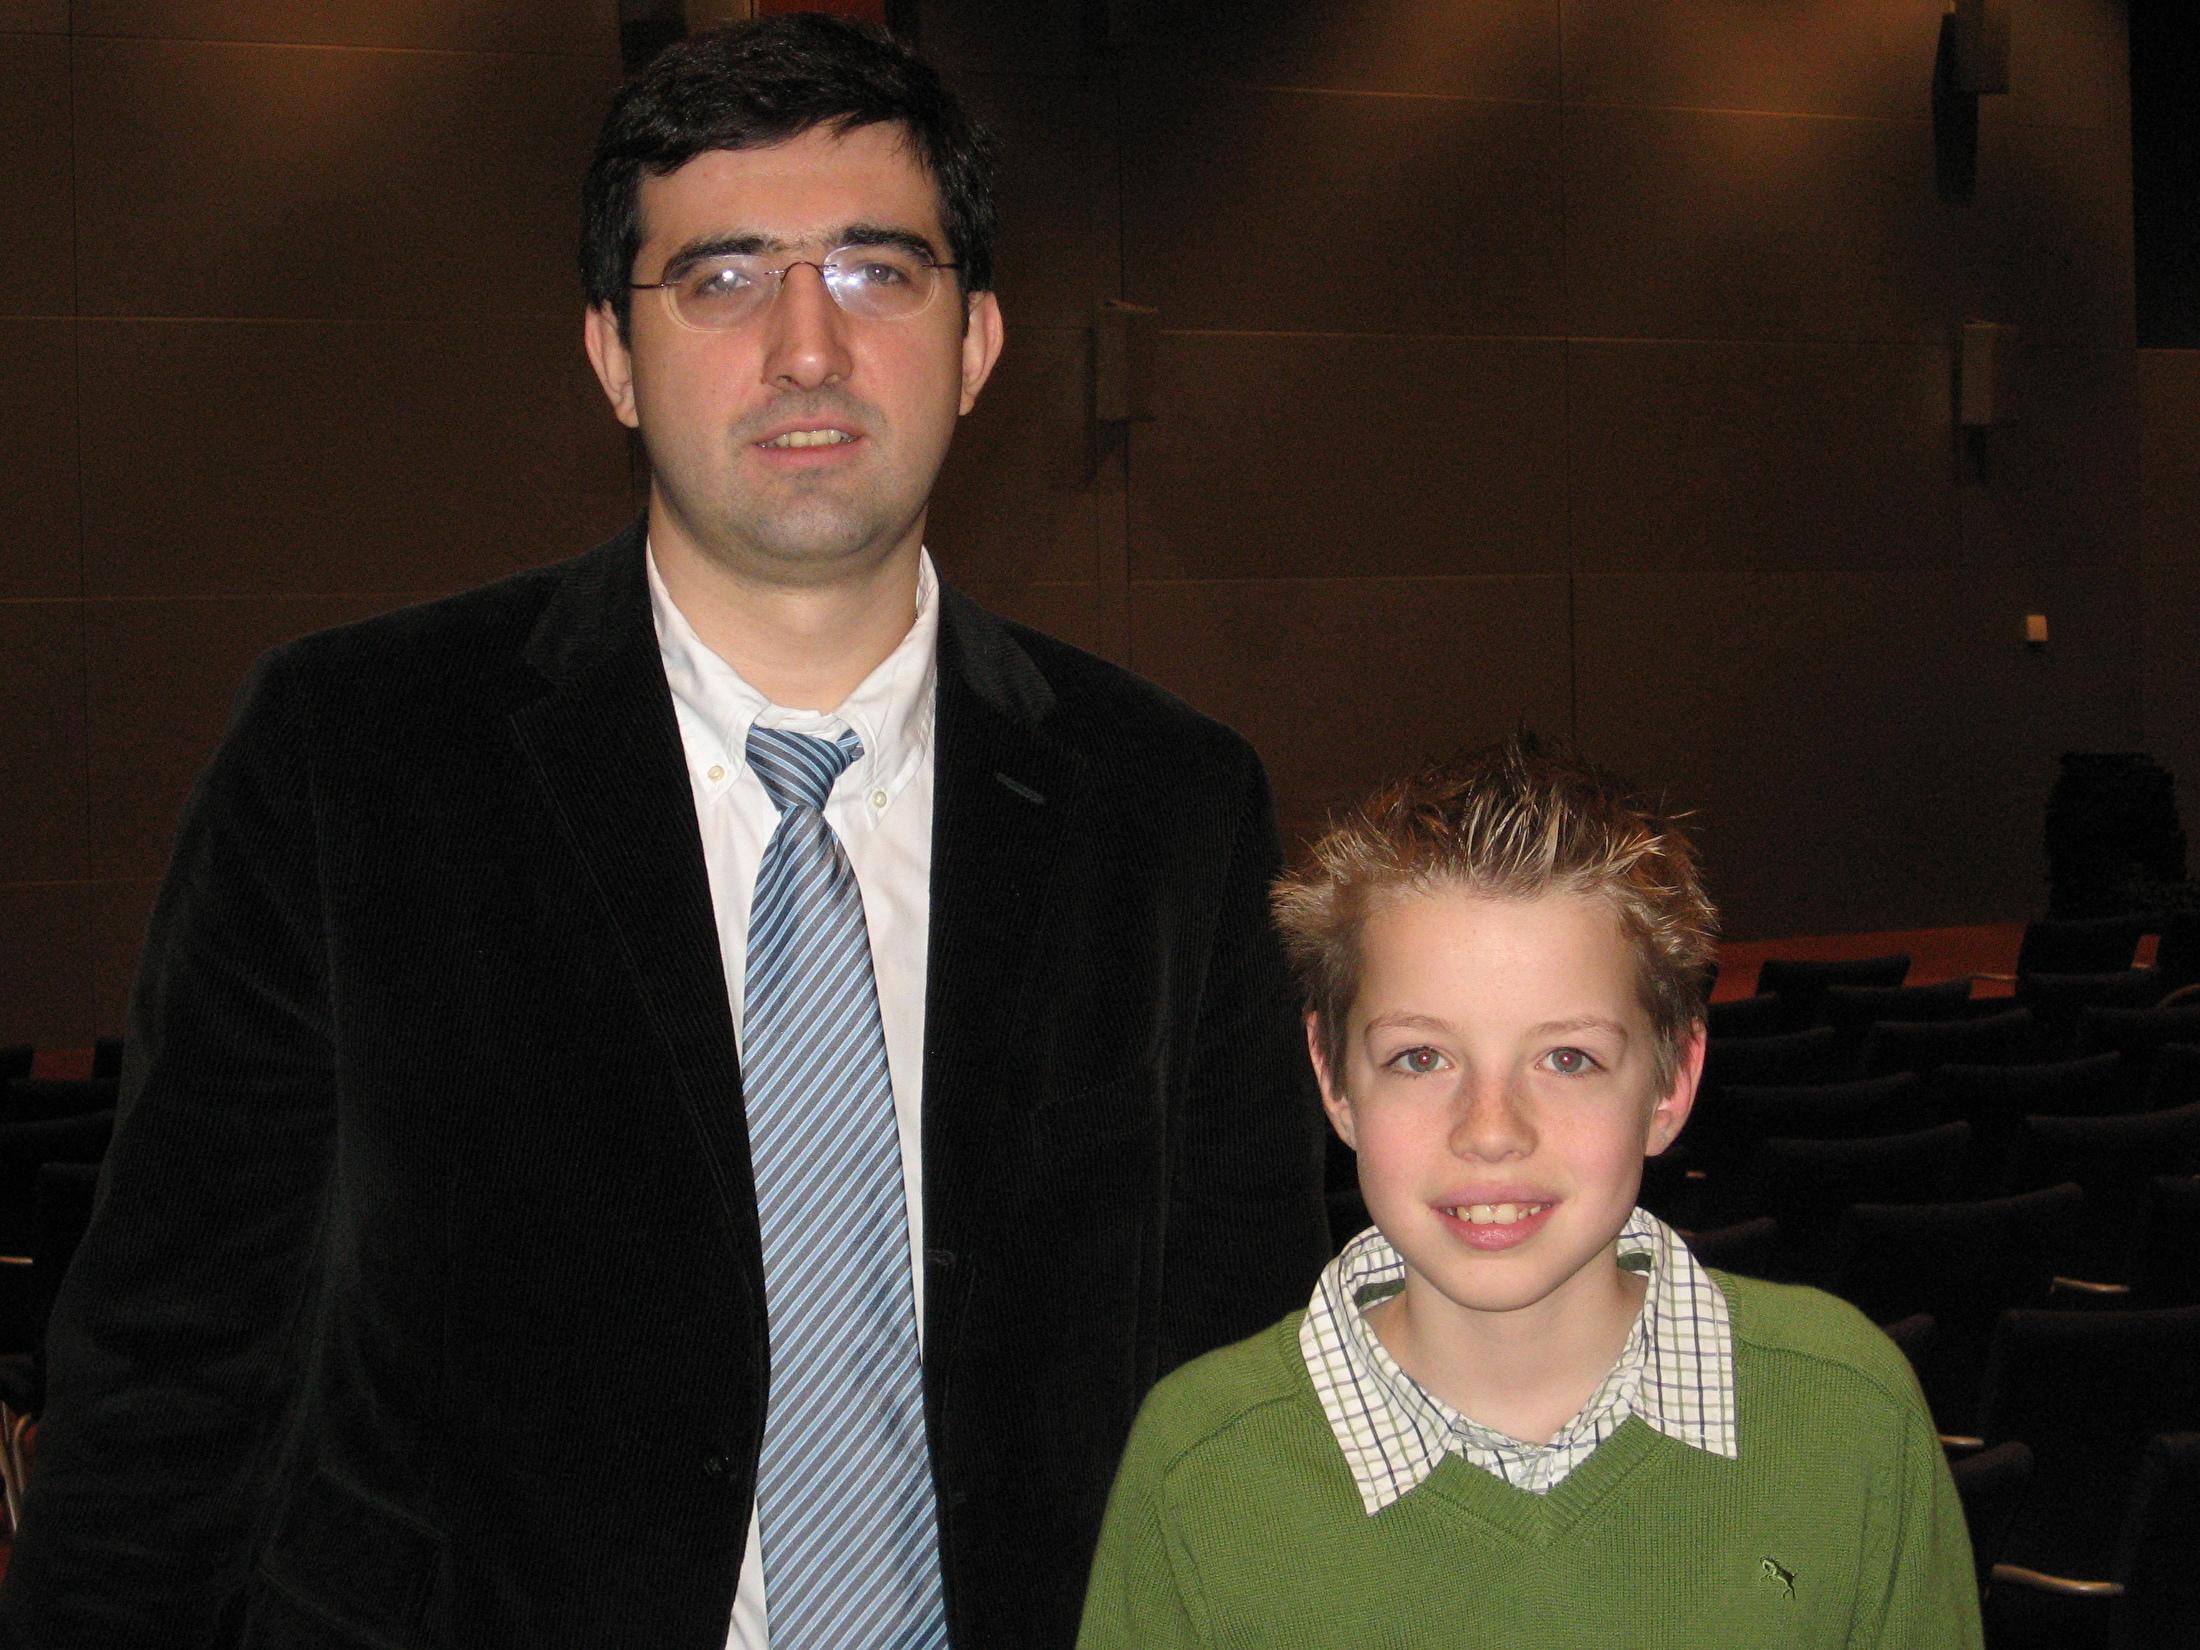 Brian met Vladimir Kramnik